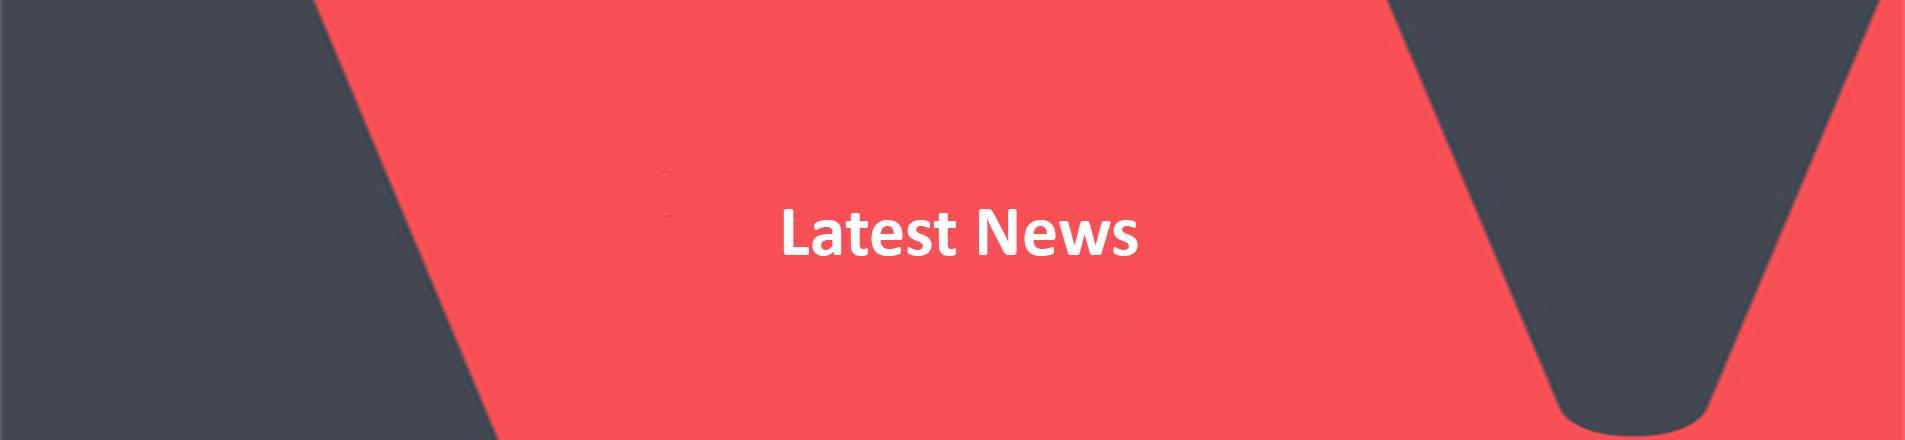 Words Latest News on red VERCIDA branded background